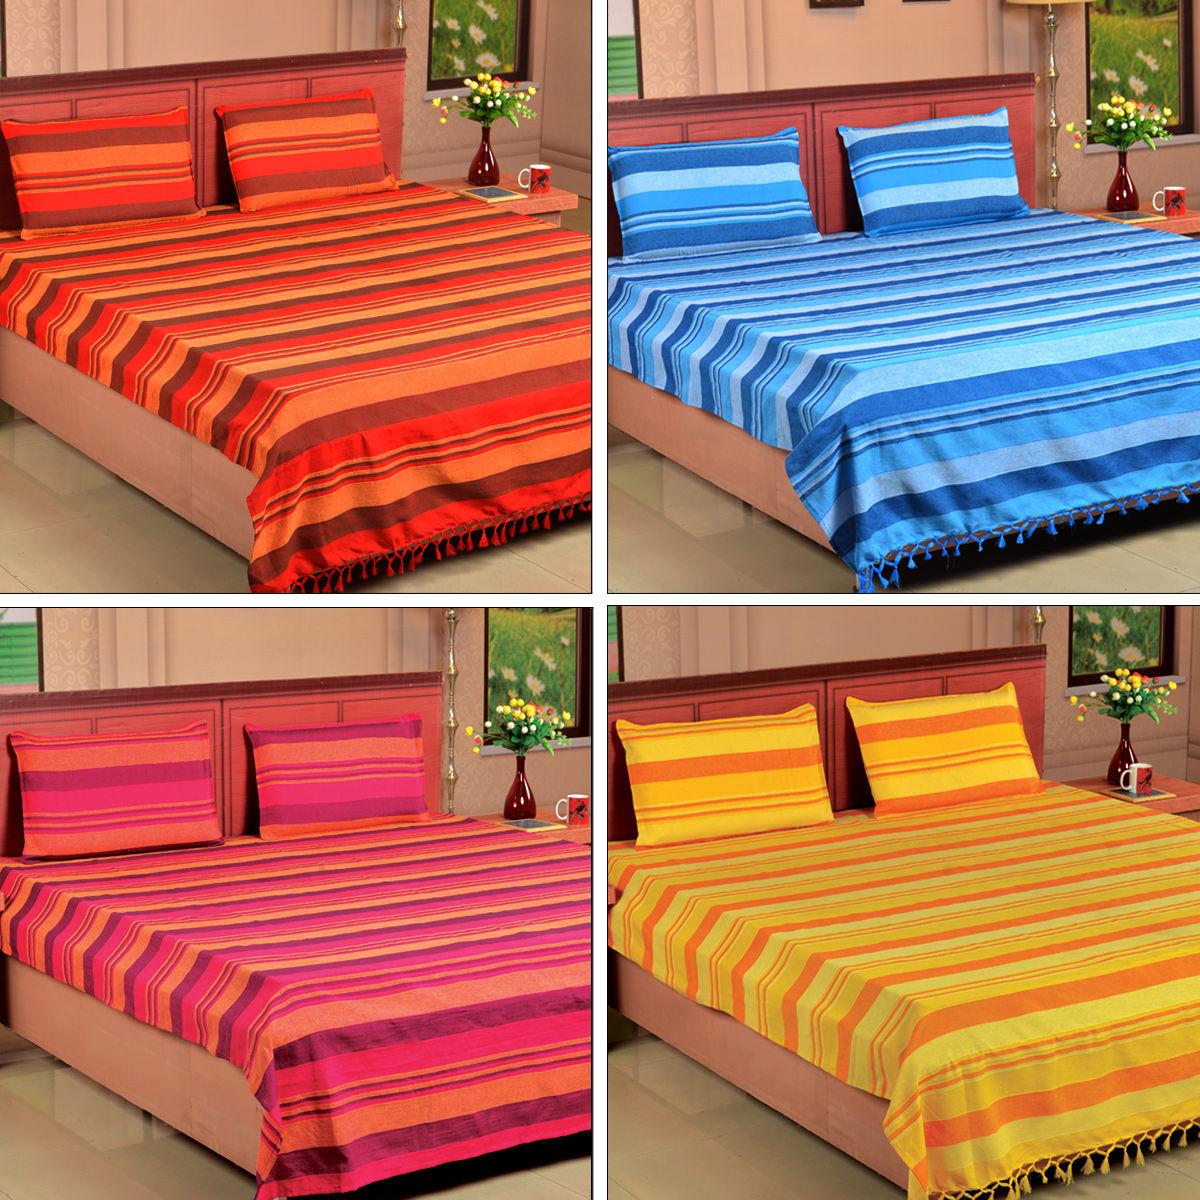 Buy Set of 4 Handmade Kerala Bedsheets Online at Best Price in India on  Naaptol.com 33b928563b99